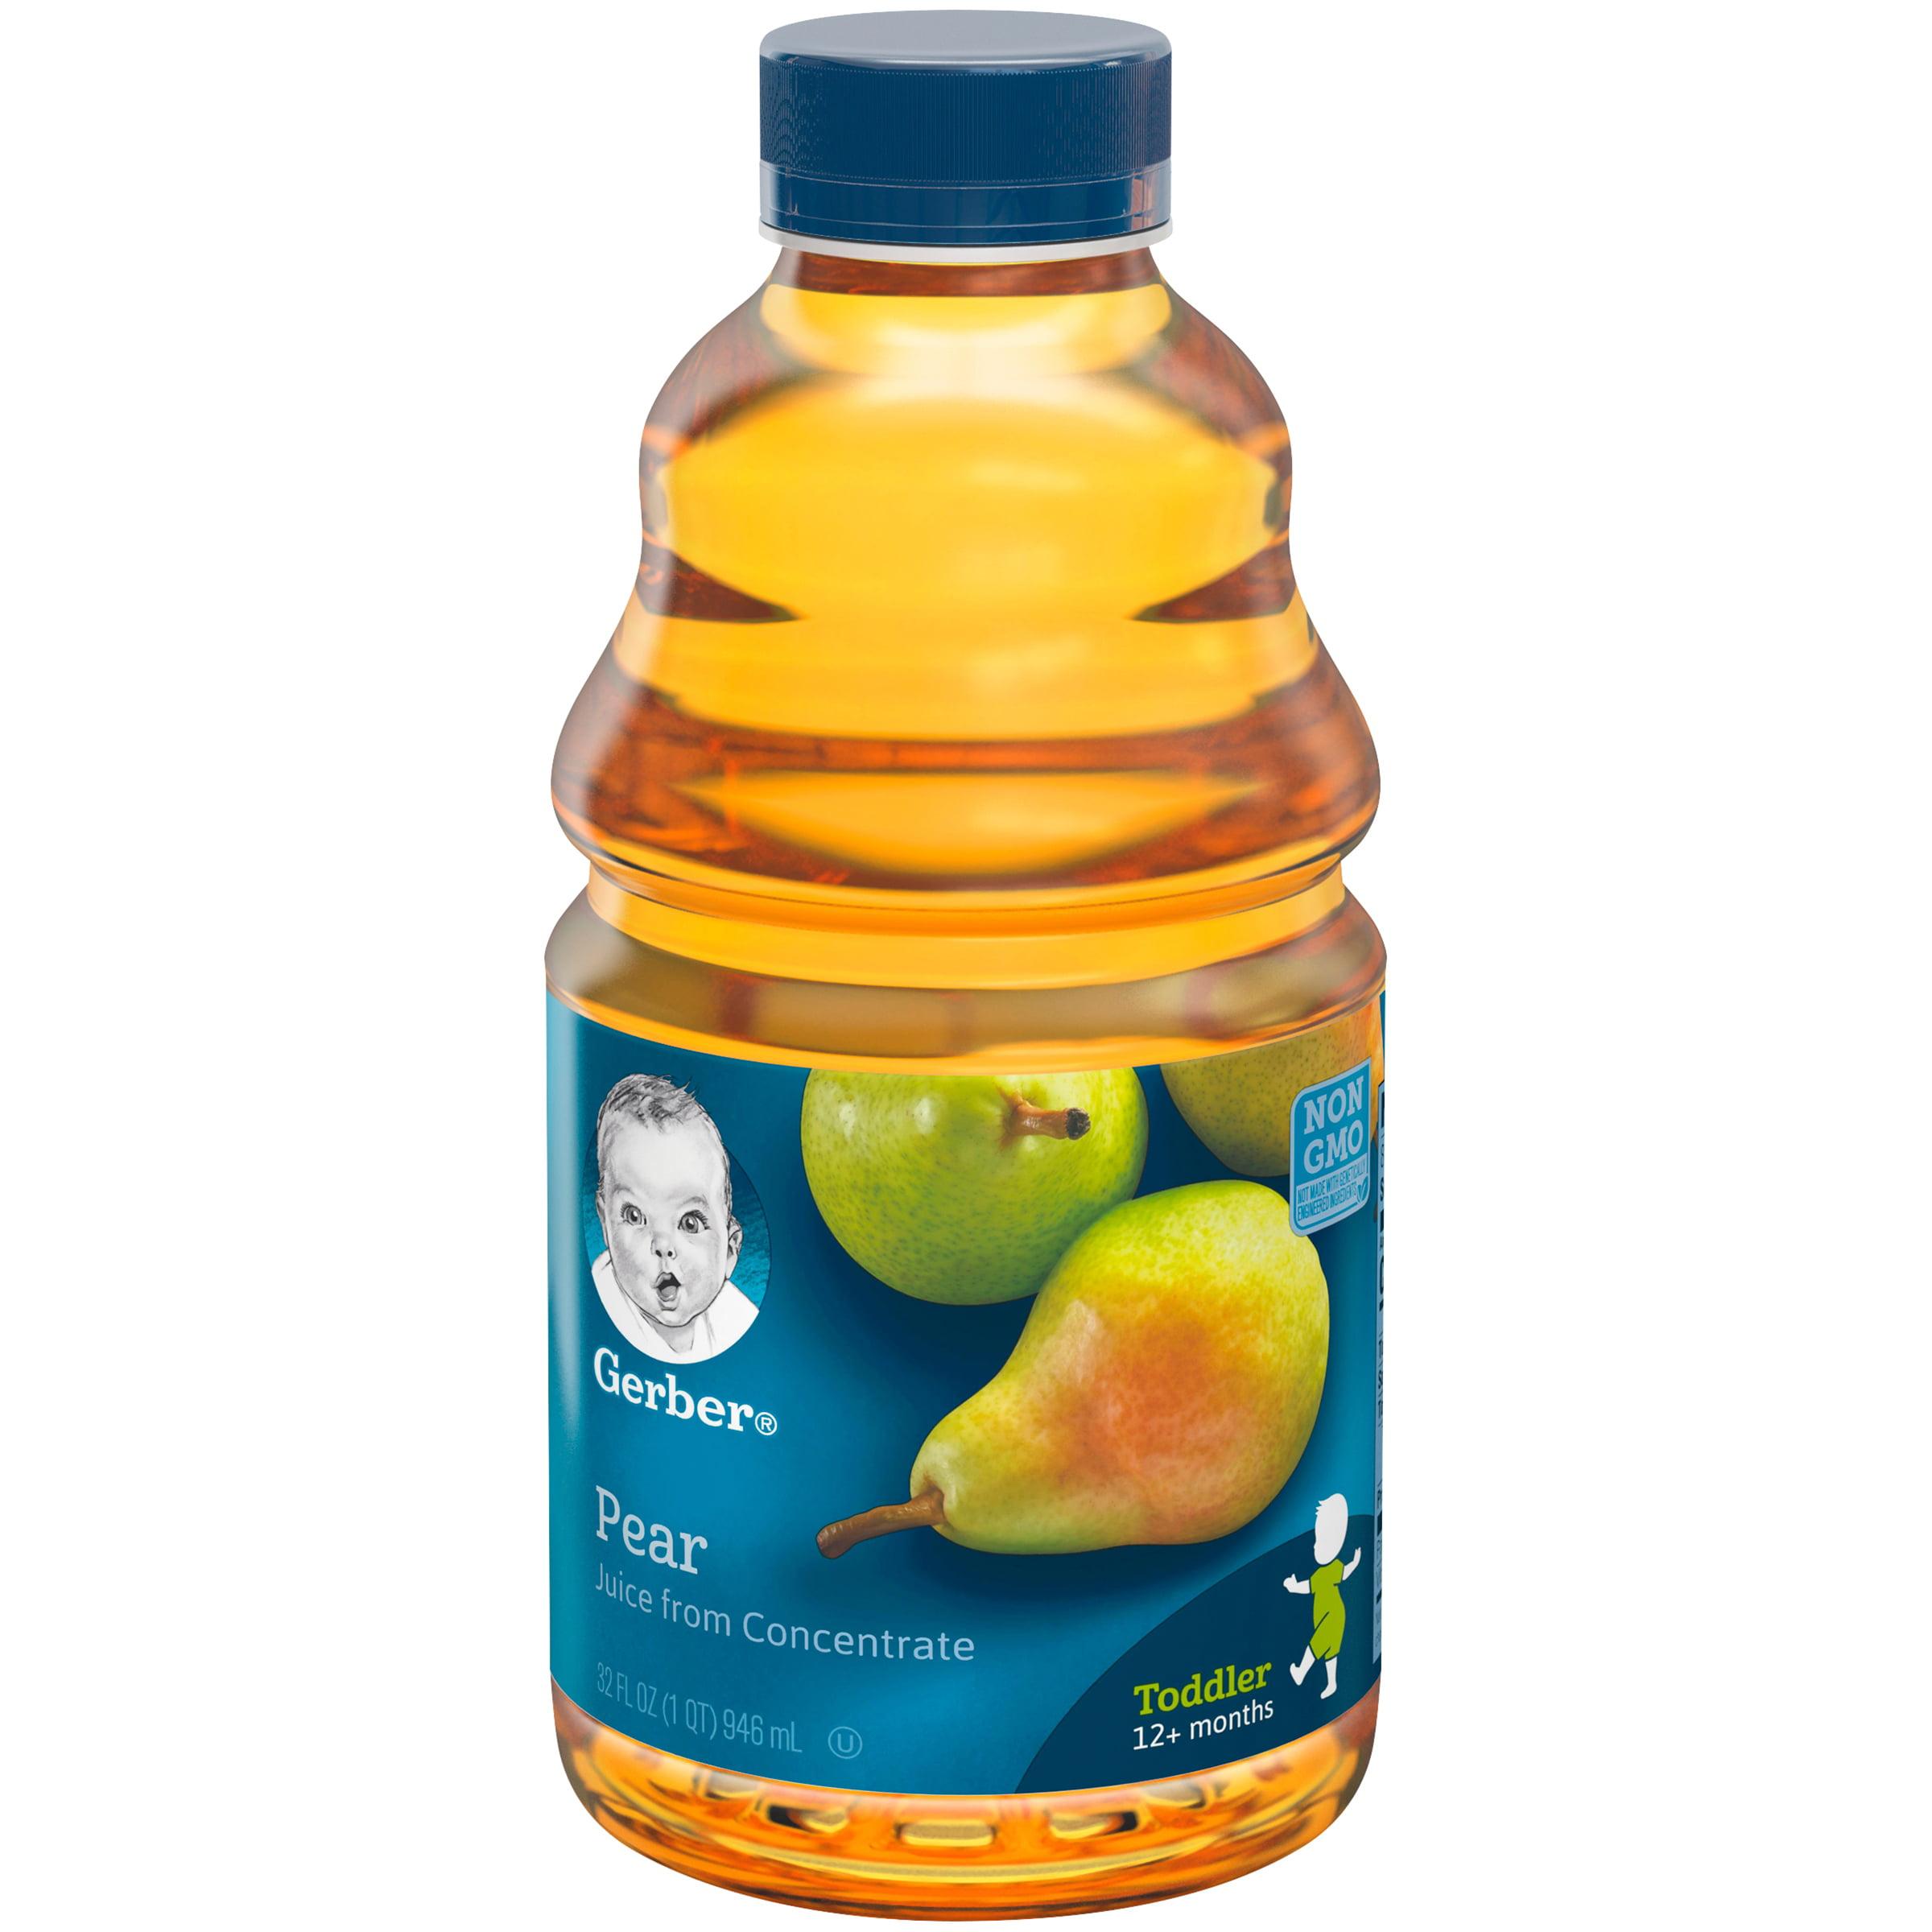 Gerber Pear Juice 32 fl. oz. Bottle